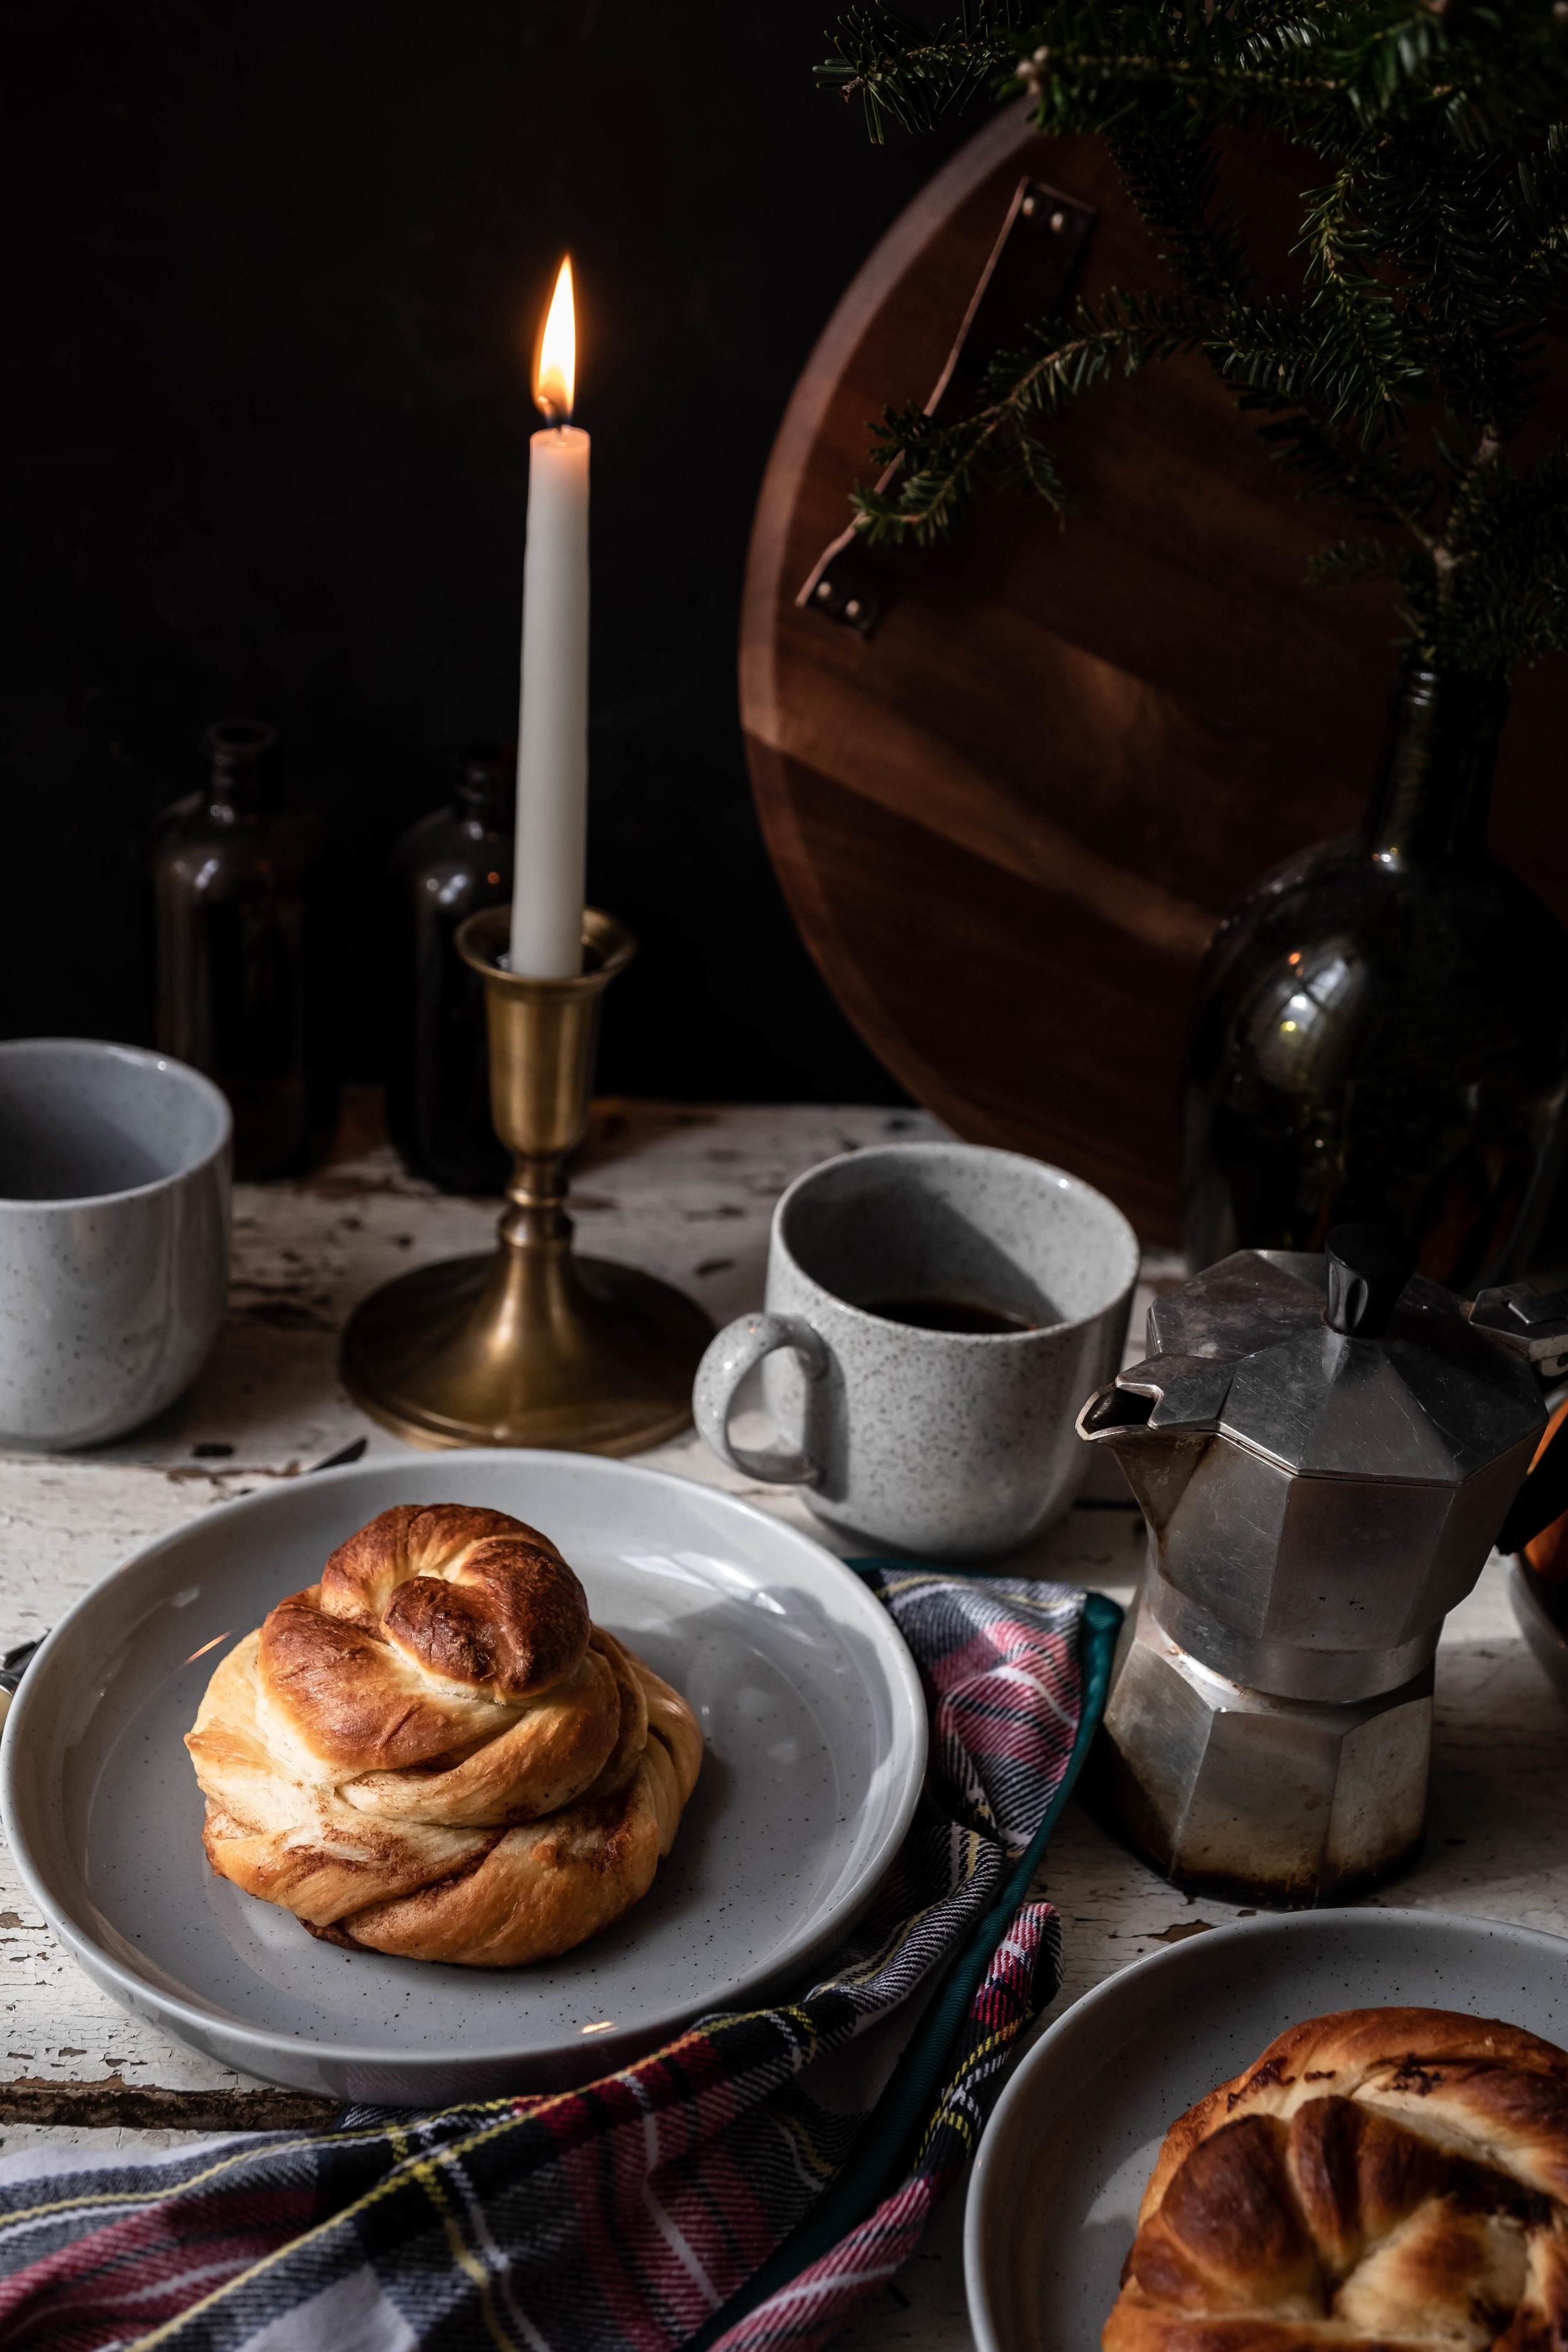 ROSE & IVY Journal Christmas Morning | 'Kanelbullar' Swedish Cinnamon Buns From The Nordic Baking BOok